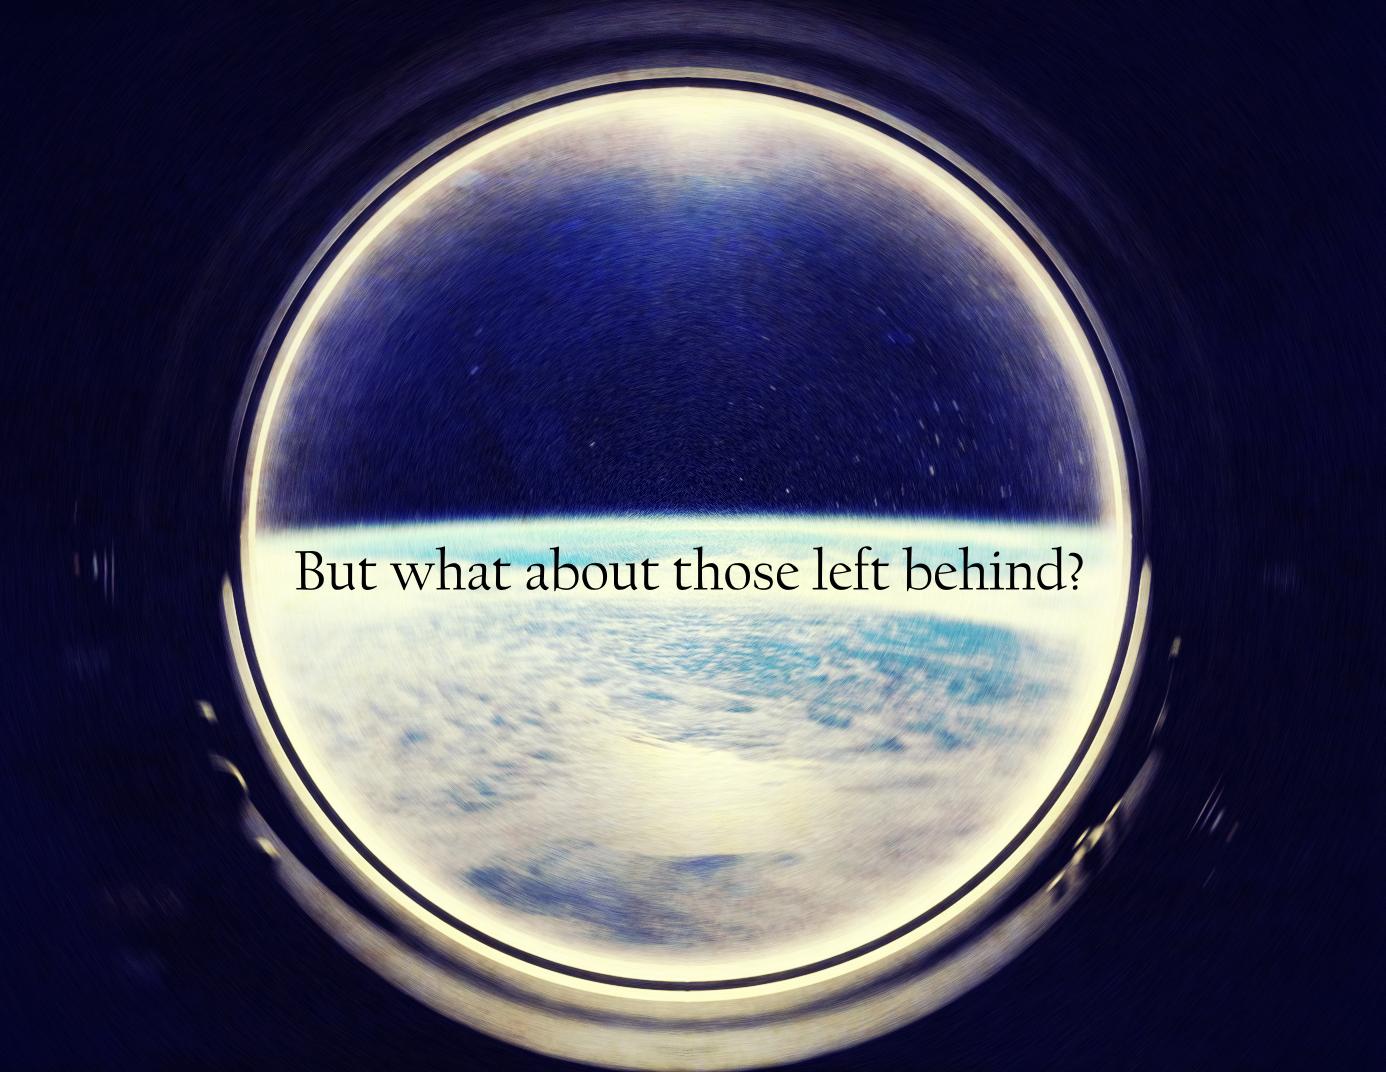 videoblocks-earth-as-seen-through-window